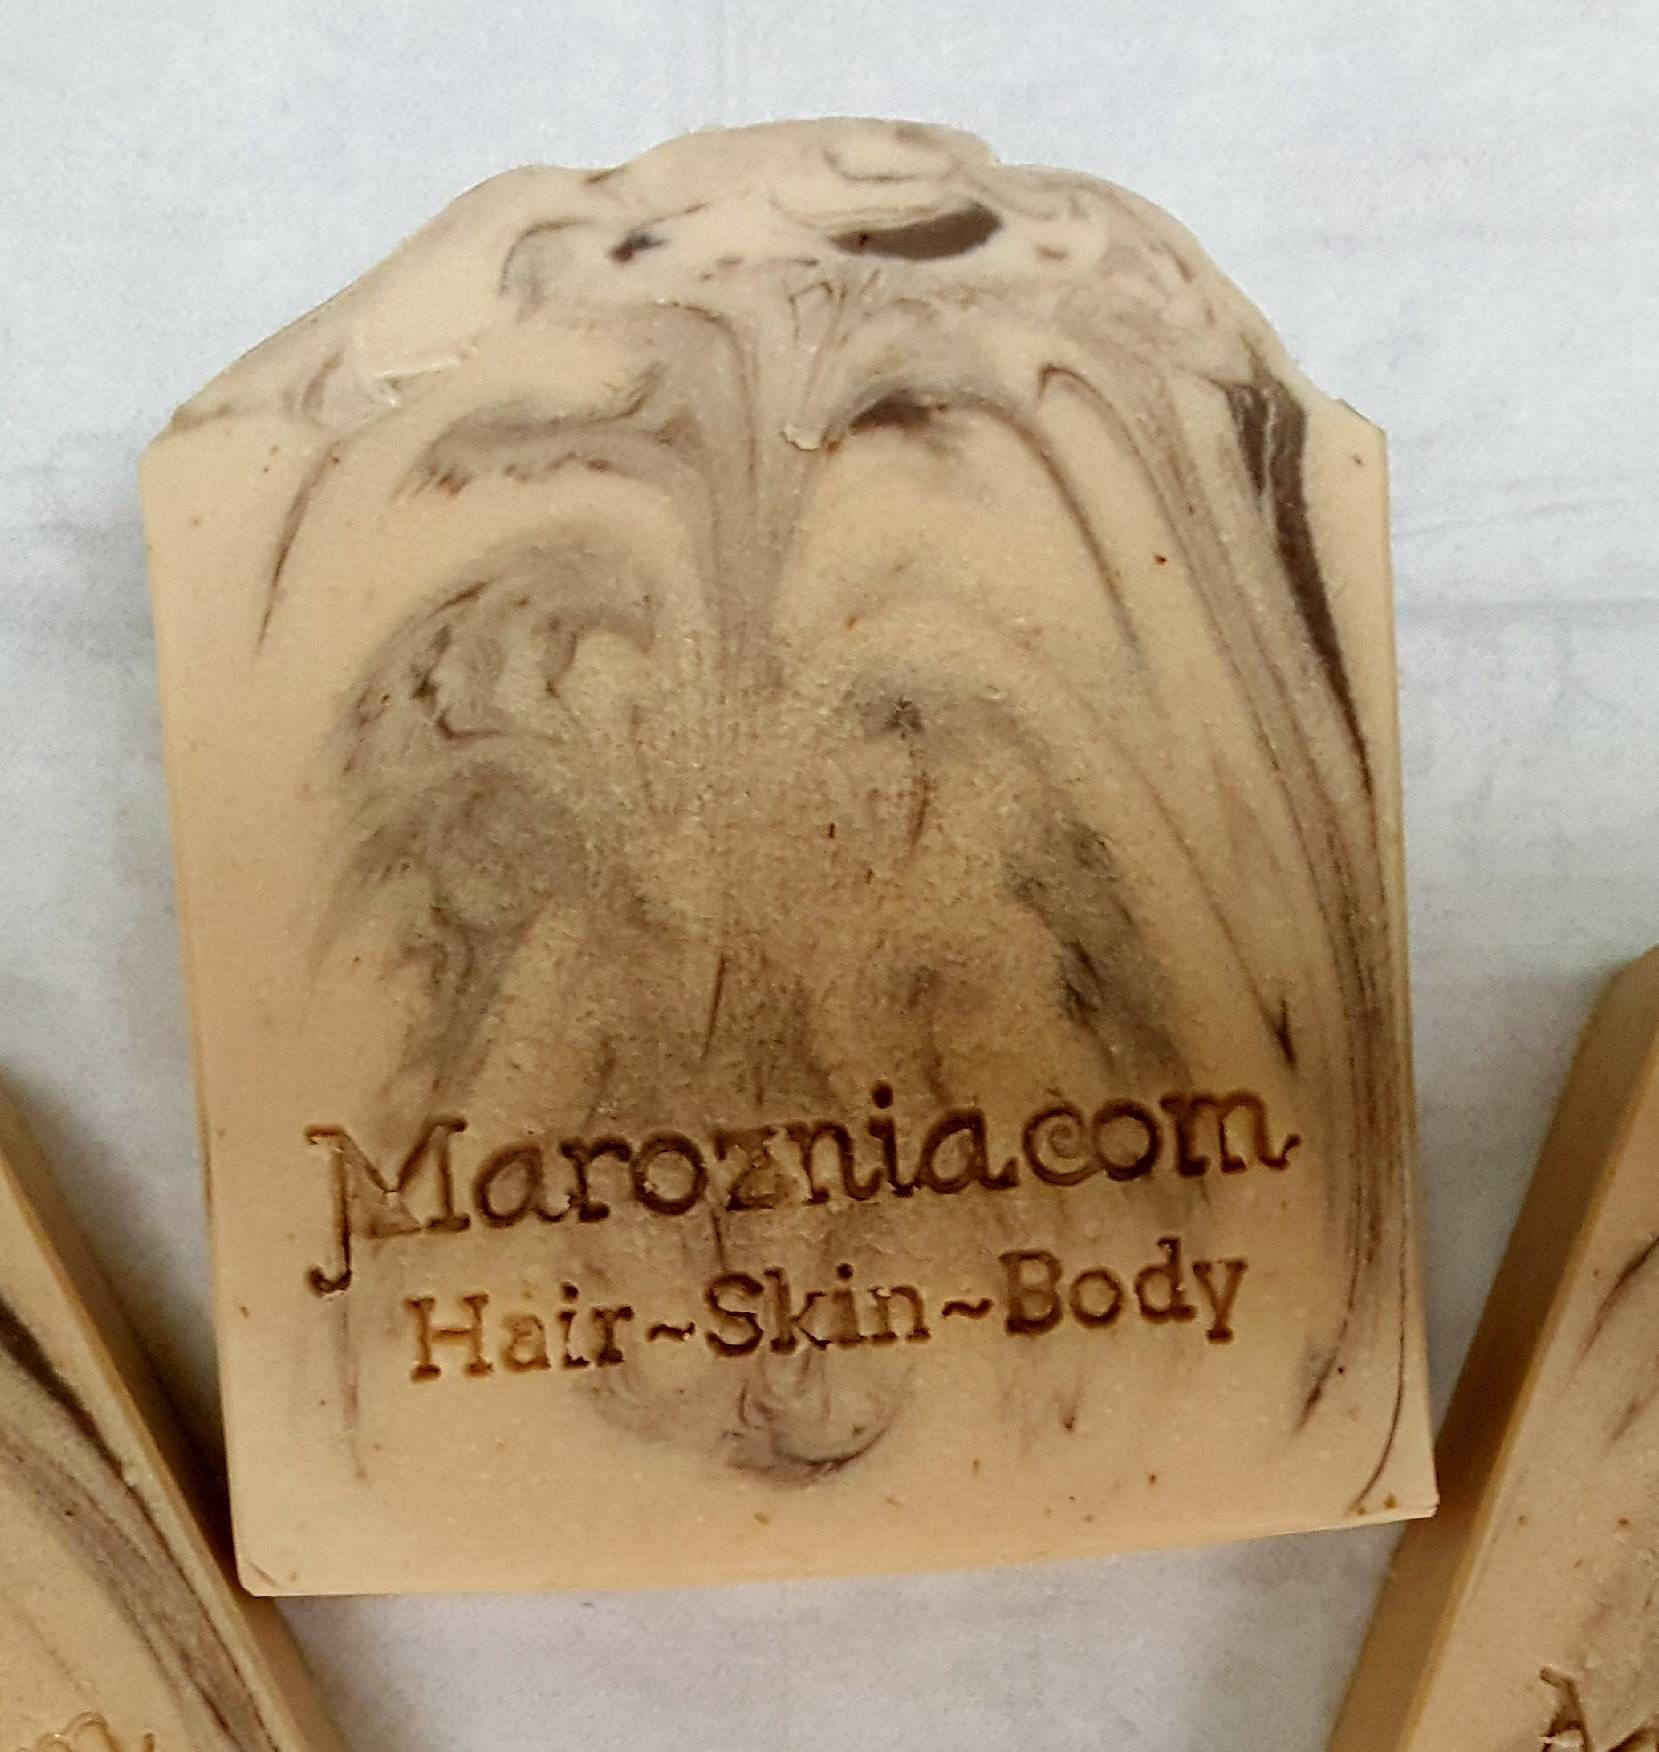 Smooth oatmeal milk u honey handcrafted spa soap bar by